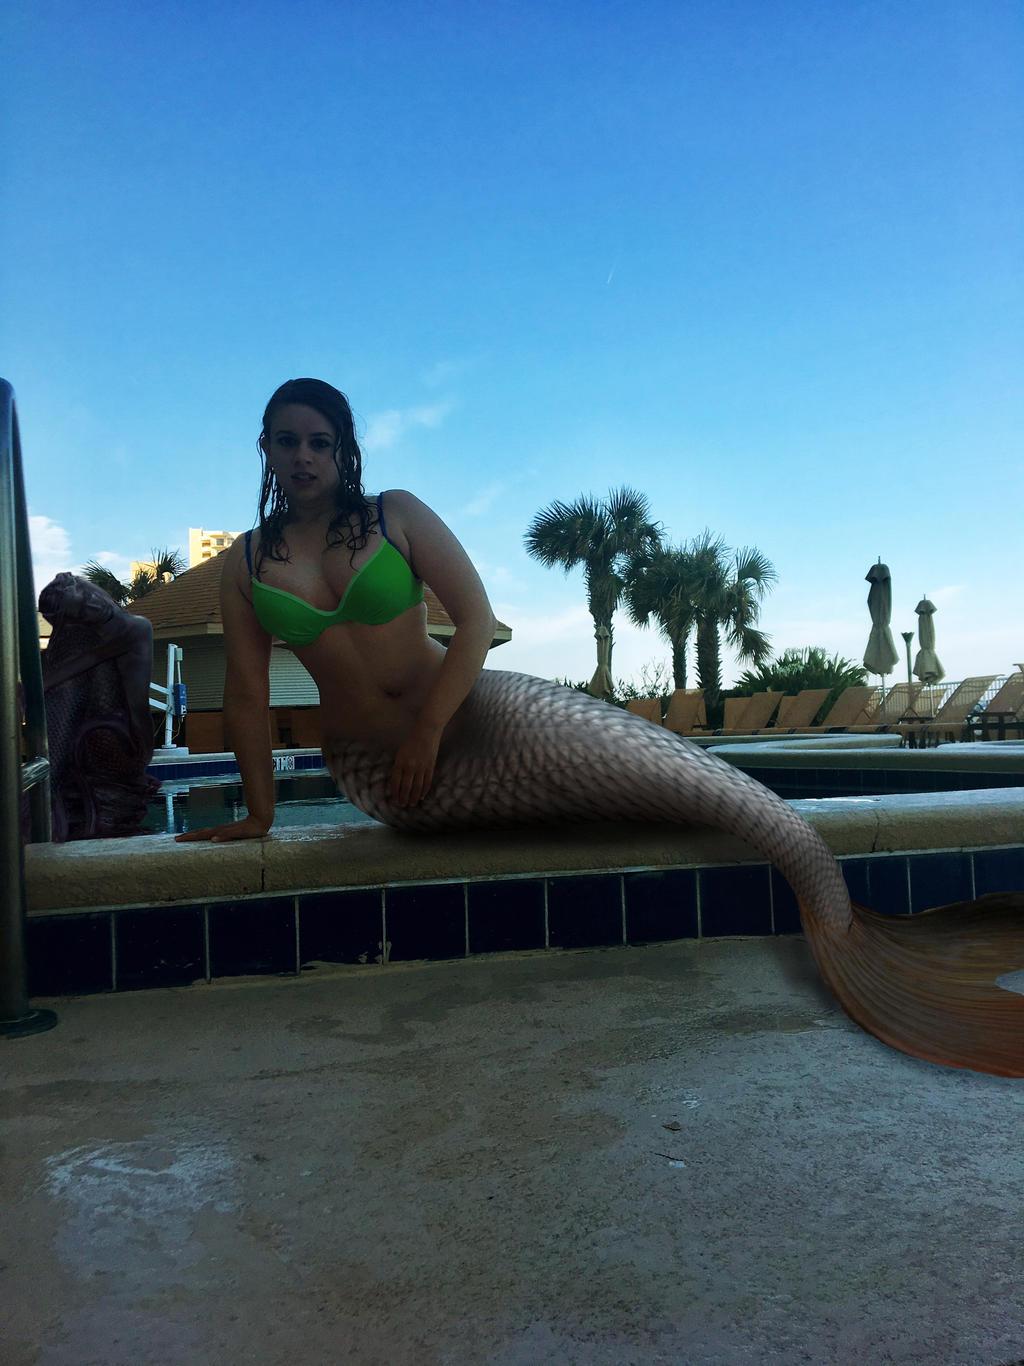 A true mermaid into the pool